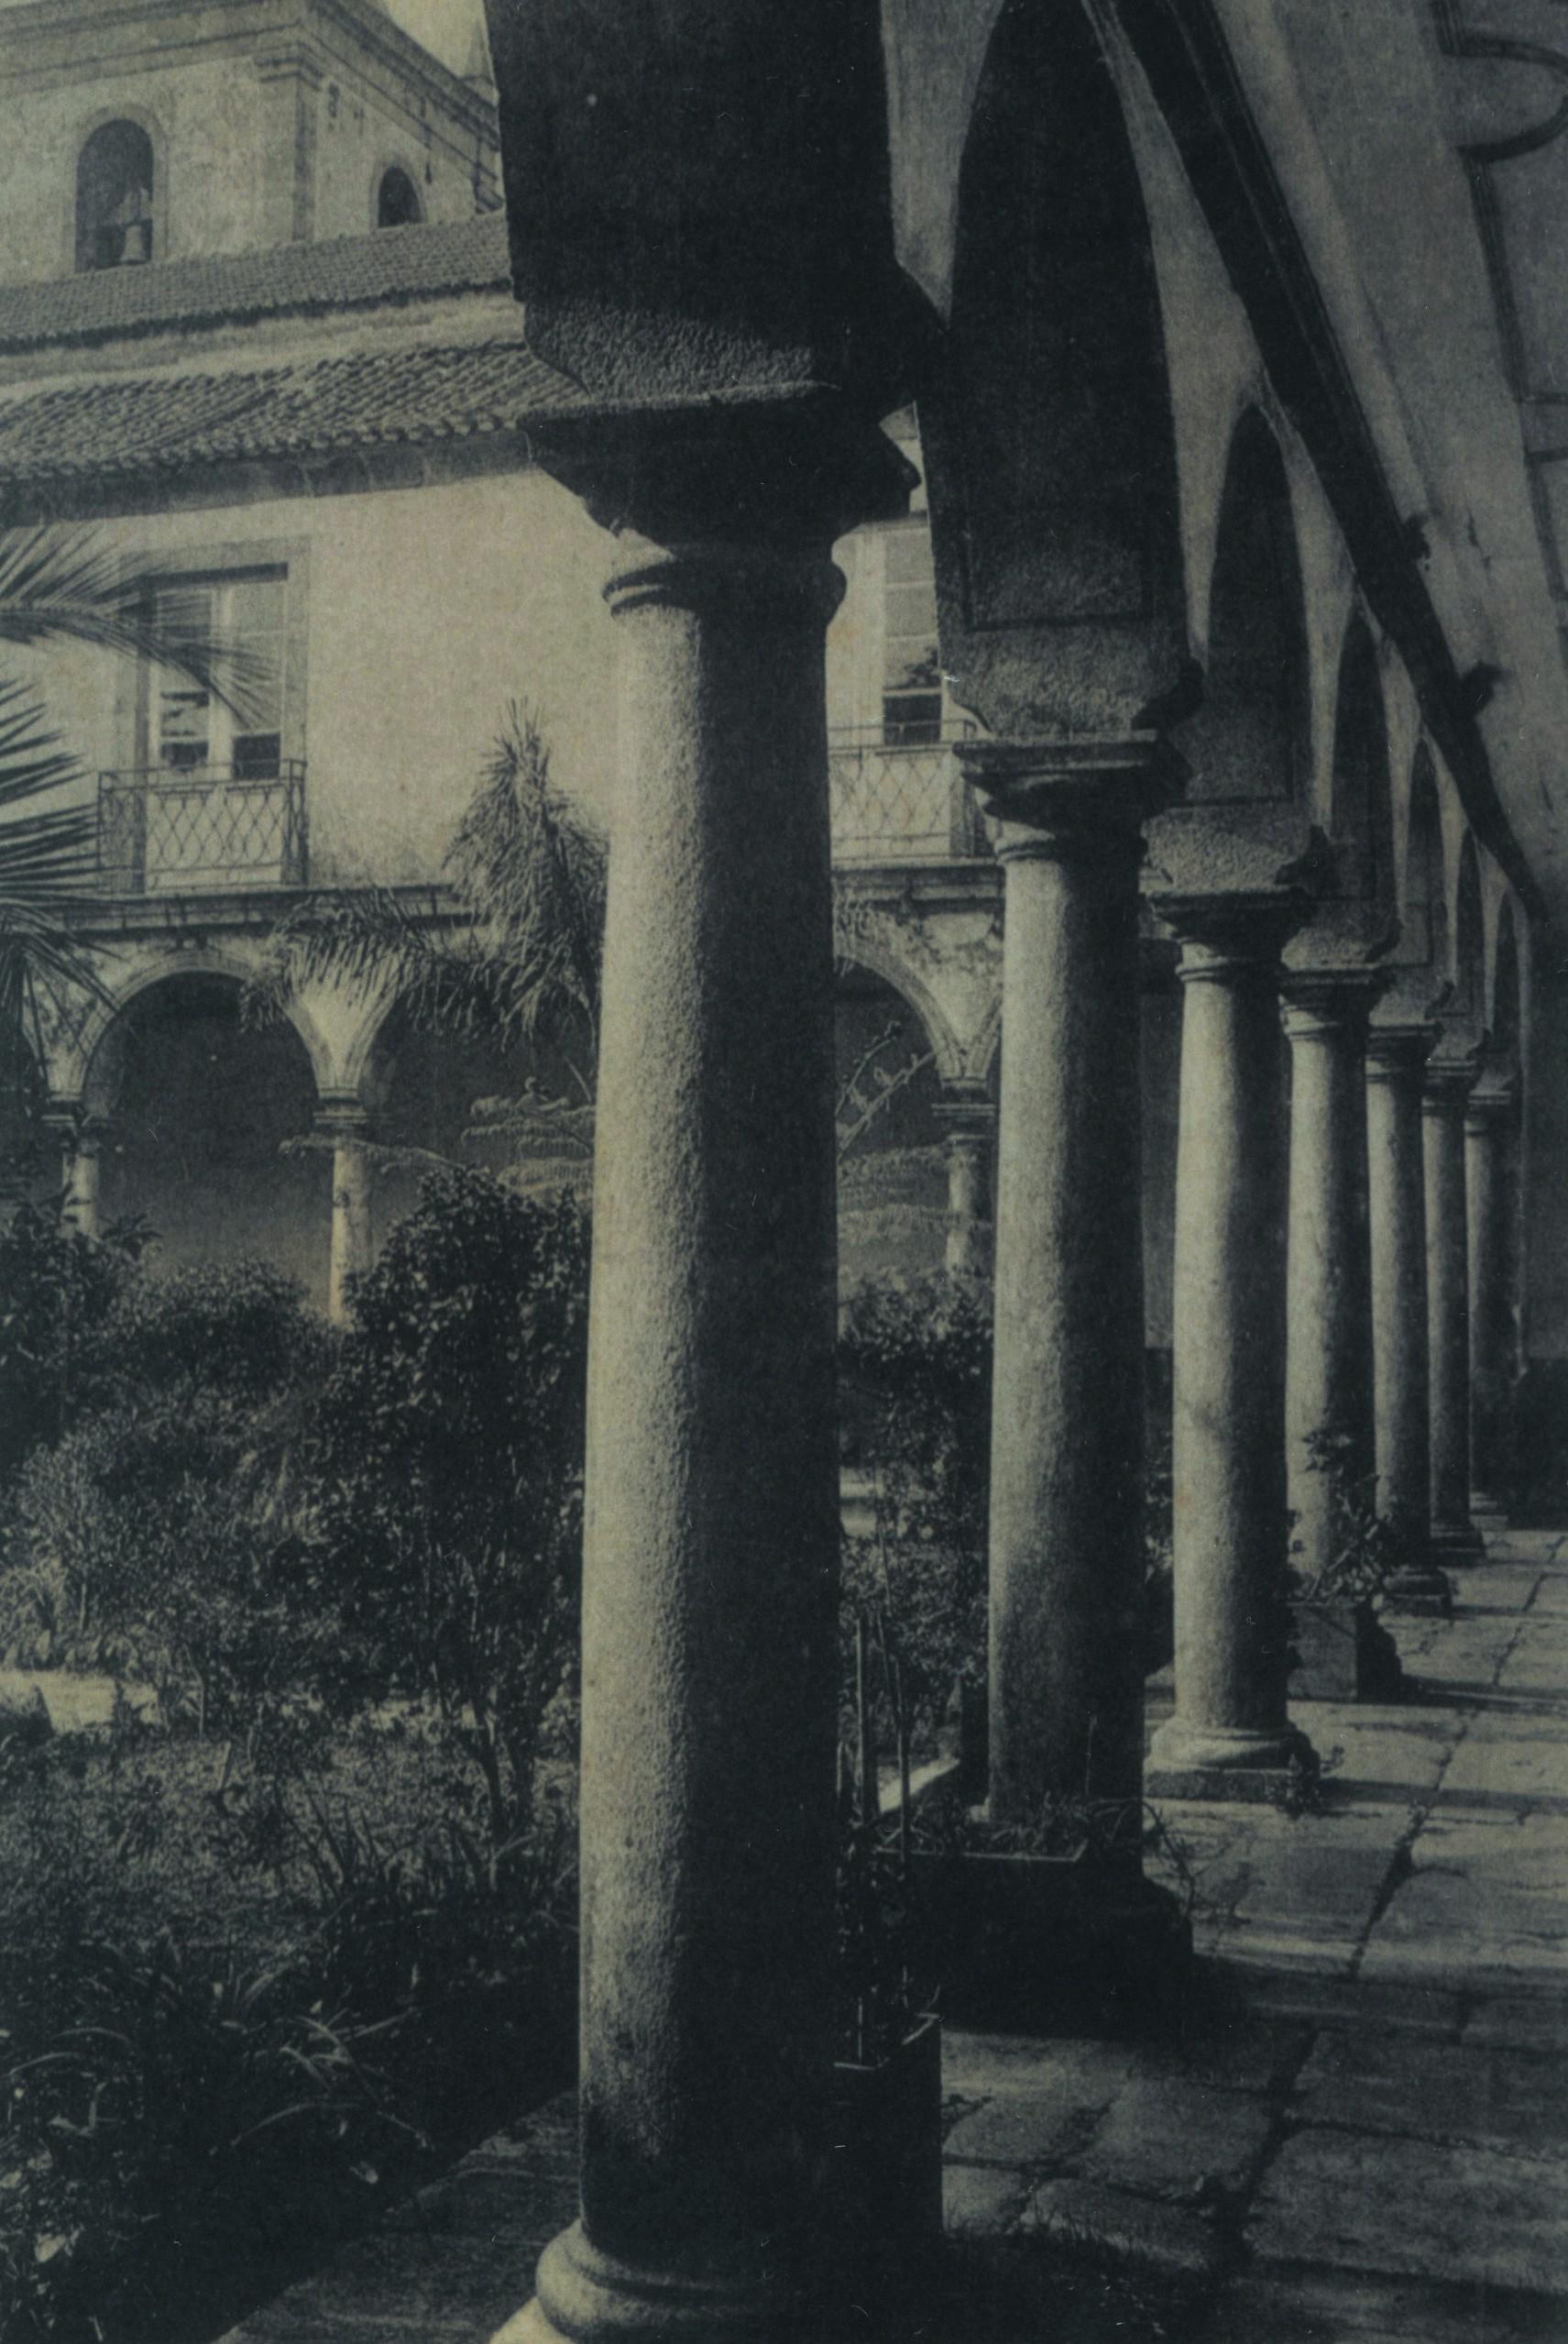 Claustro do Mosteiro, Cucujães (Anos 10)